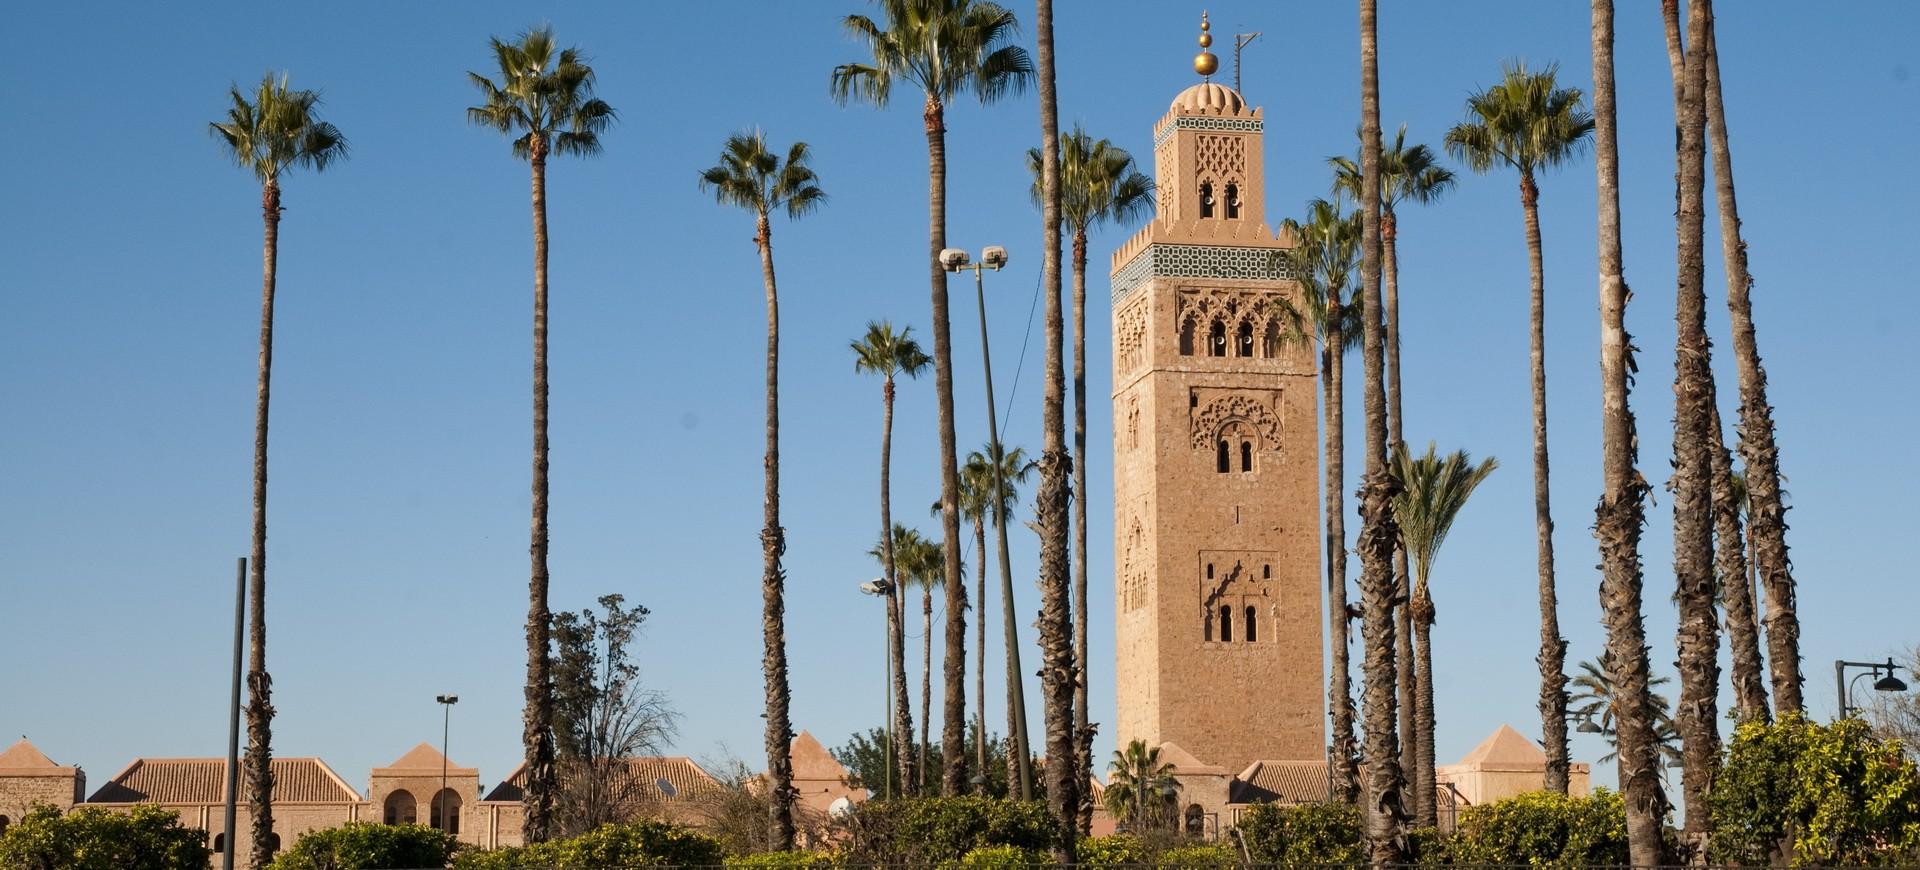 La Koutoubia à Marrakech au Maroc